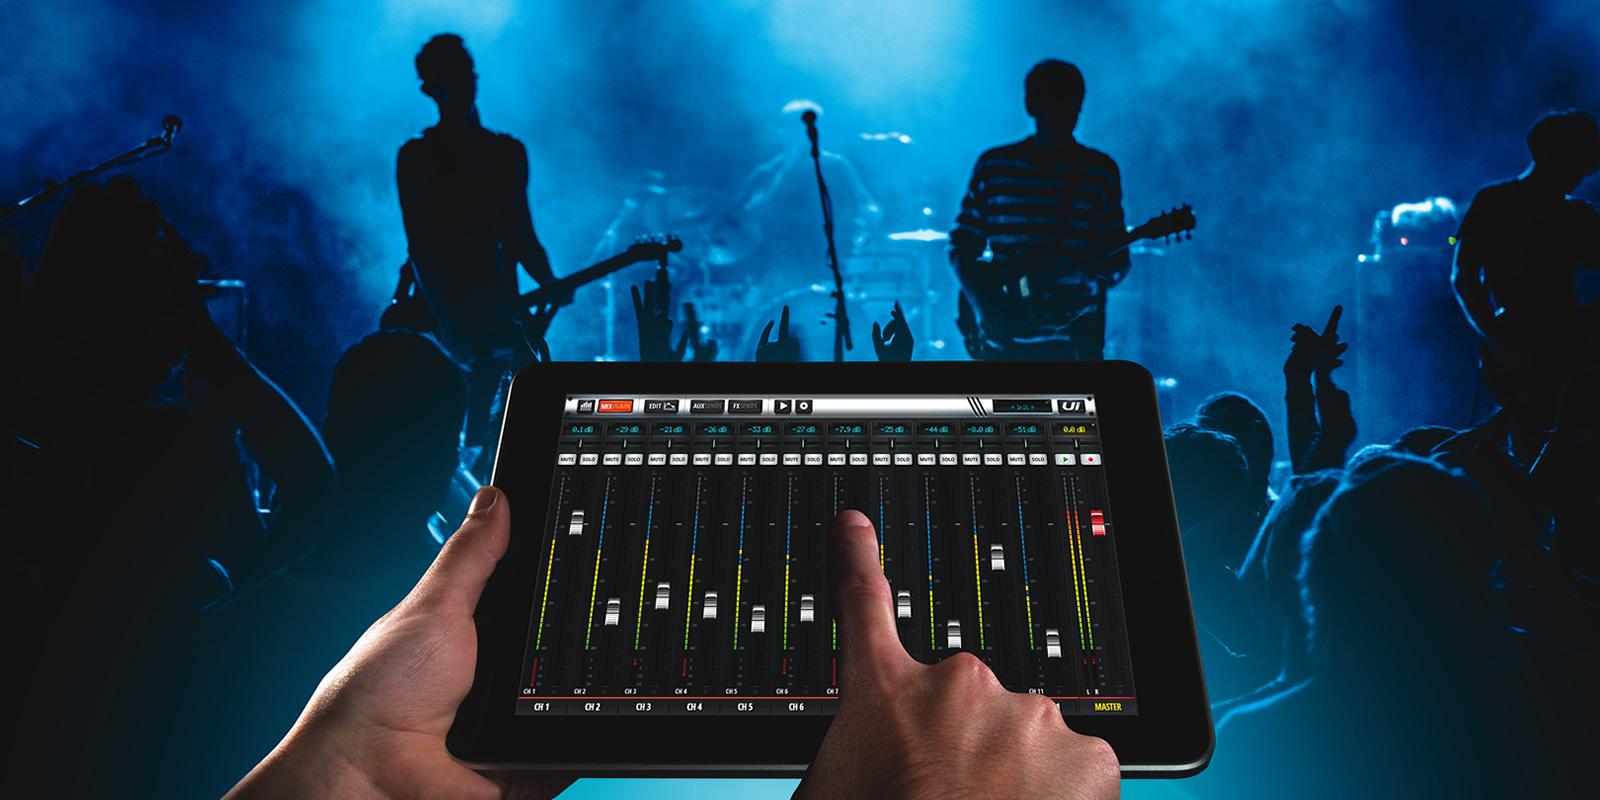 Control de la mesa de mezclas desde un iPad